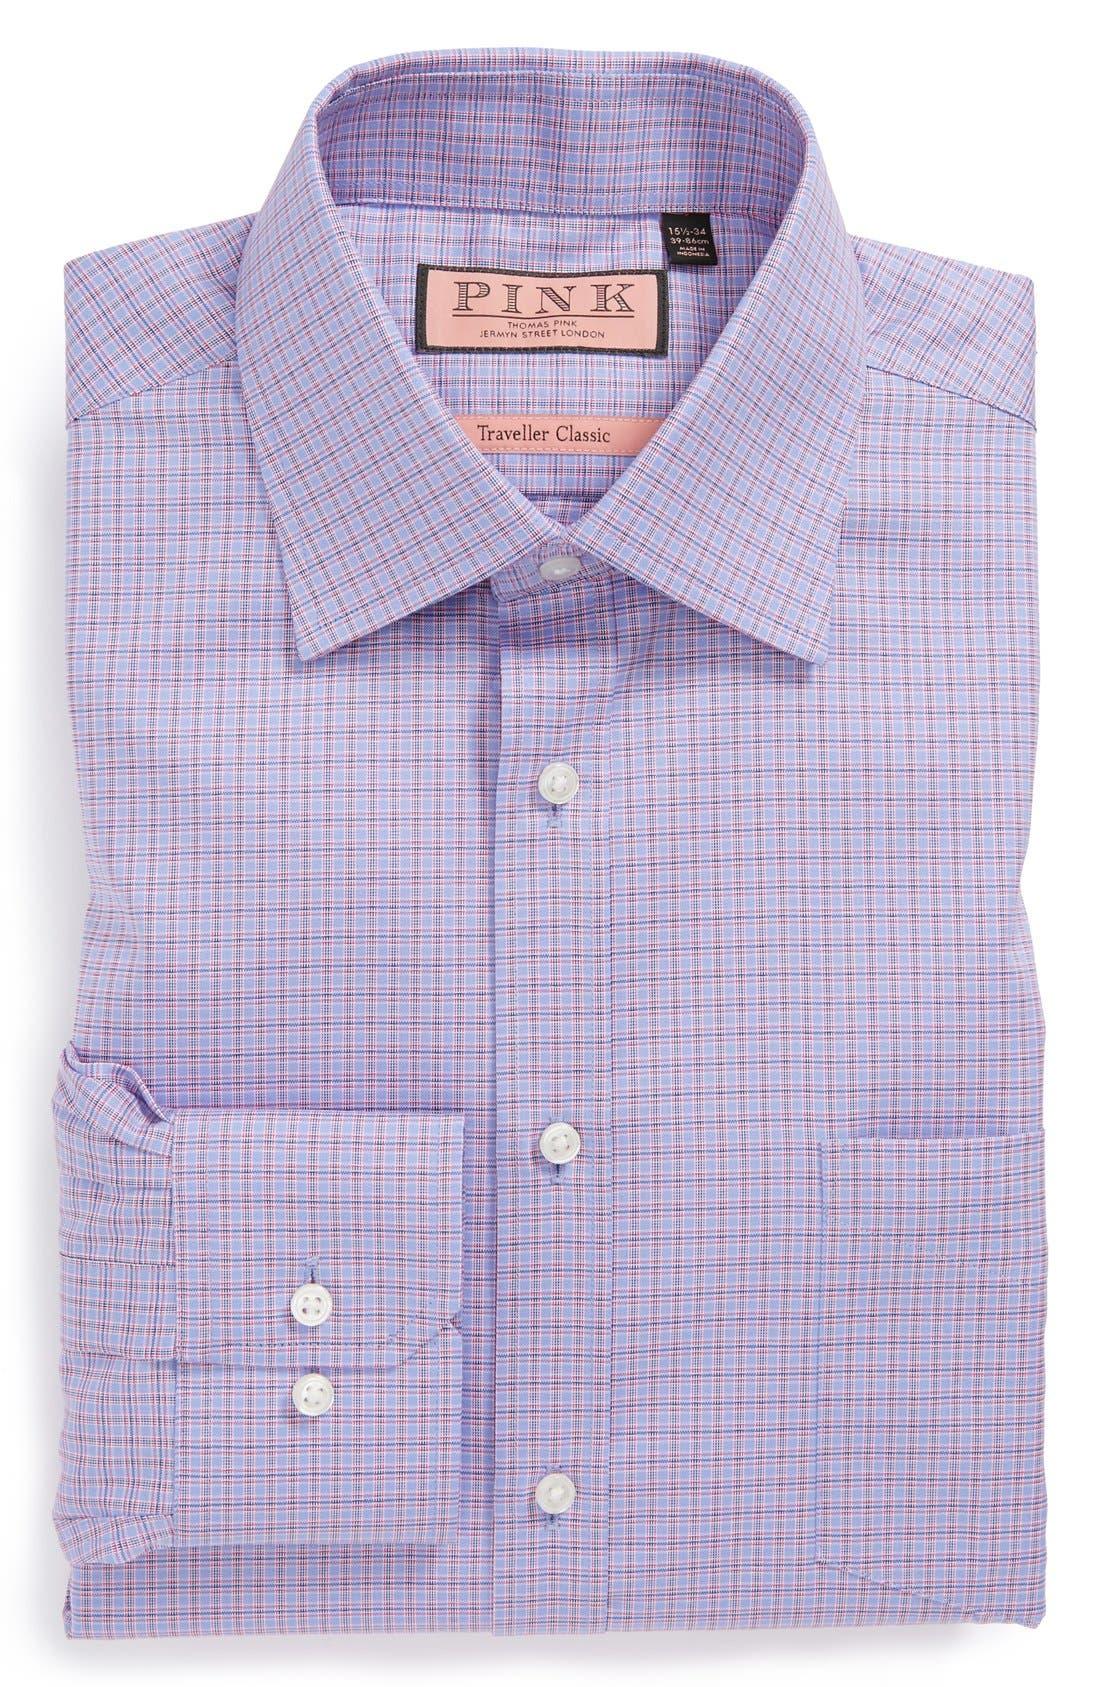 Alternate Image 1 Selected - Thomas Pink Classic Fit Traveller Dress Shirt